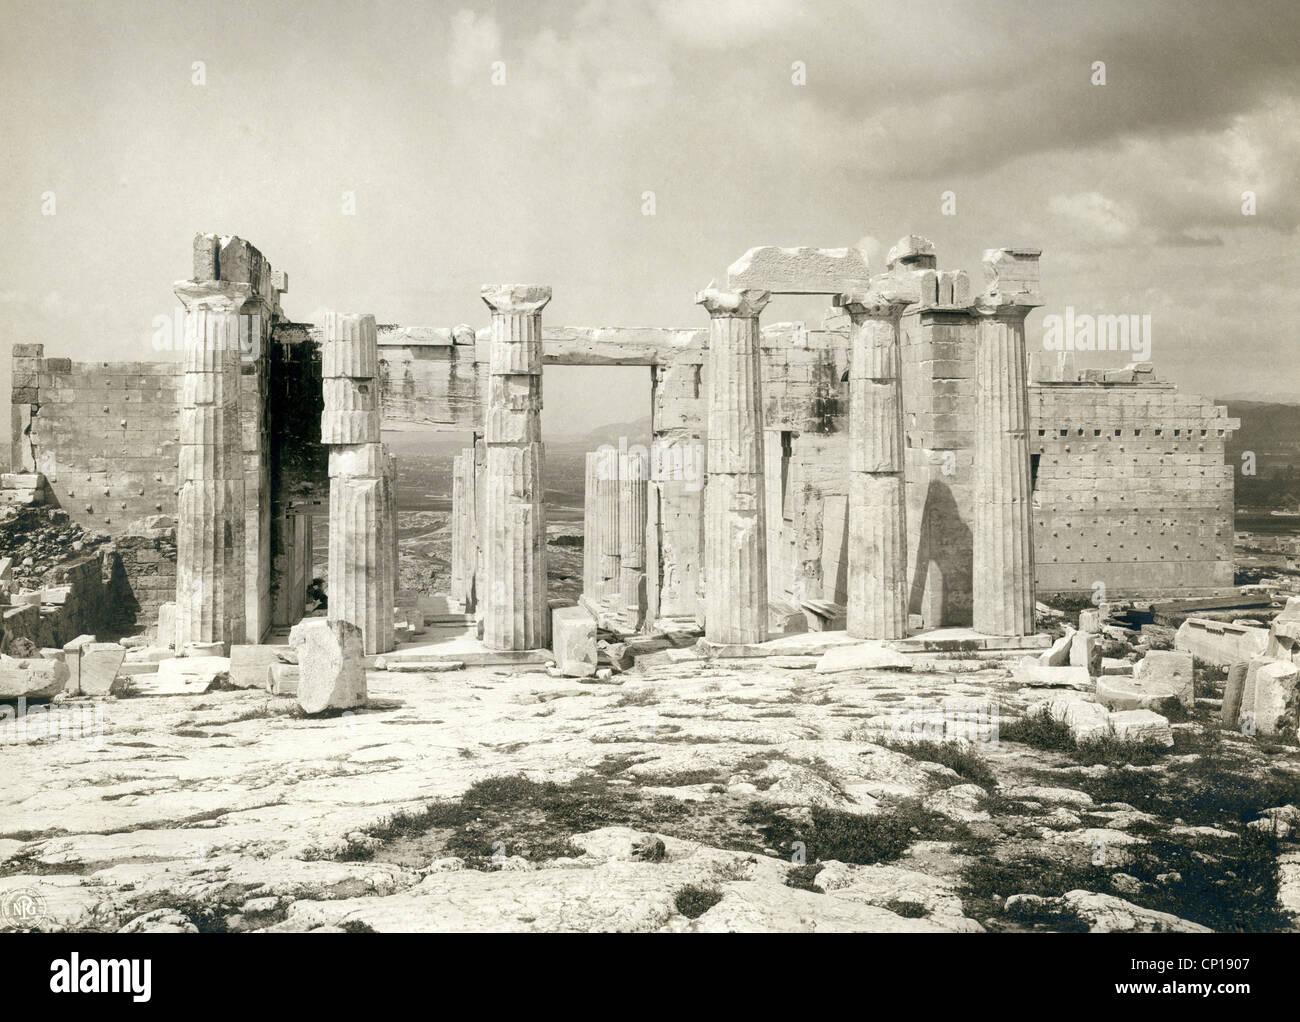 geography / travel, Greece, Athens, acropolis, Propylaea, eastern side, late 19th century, column, columns, citadel, Stock Photo